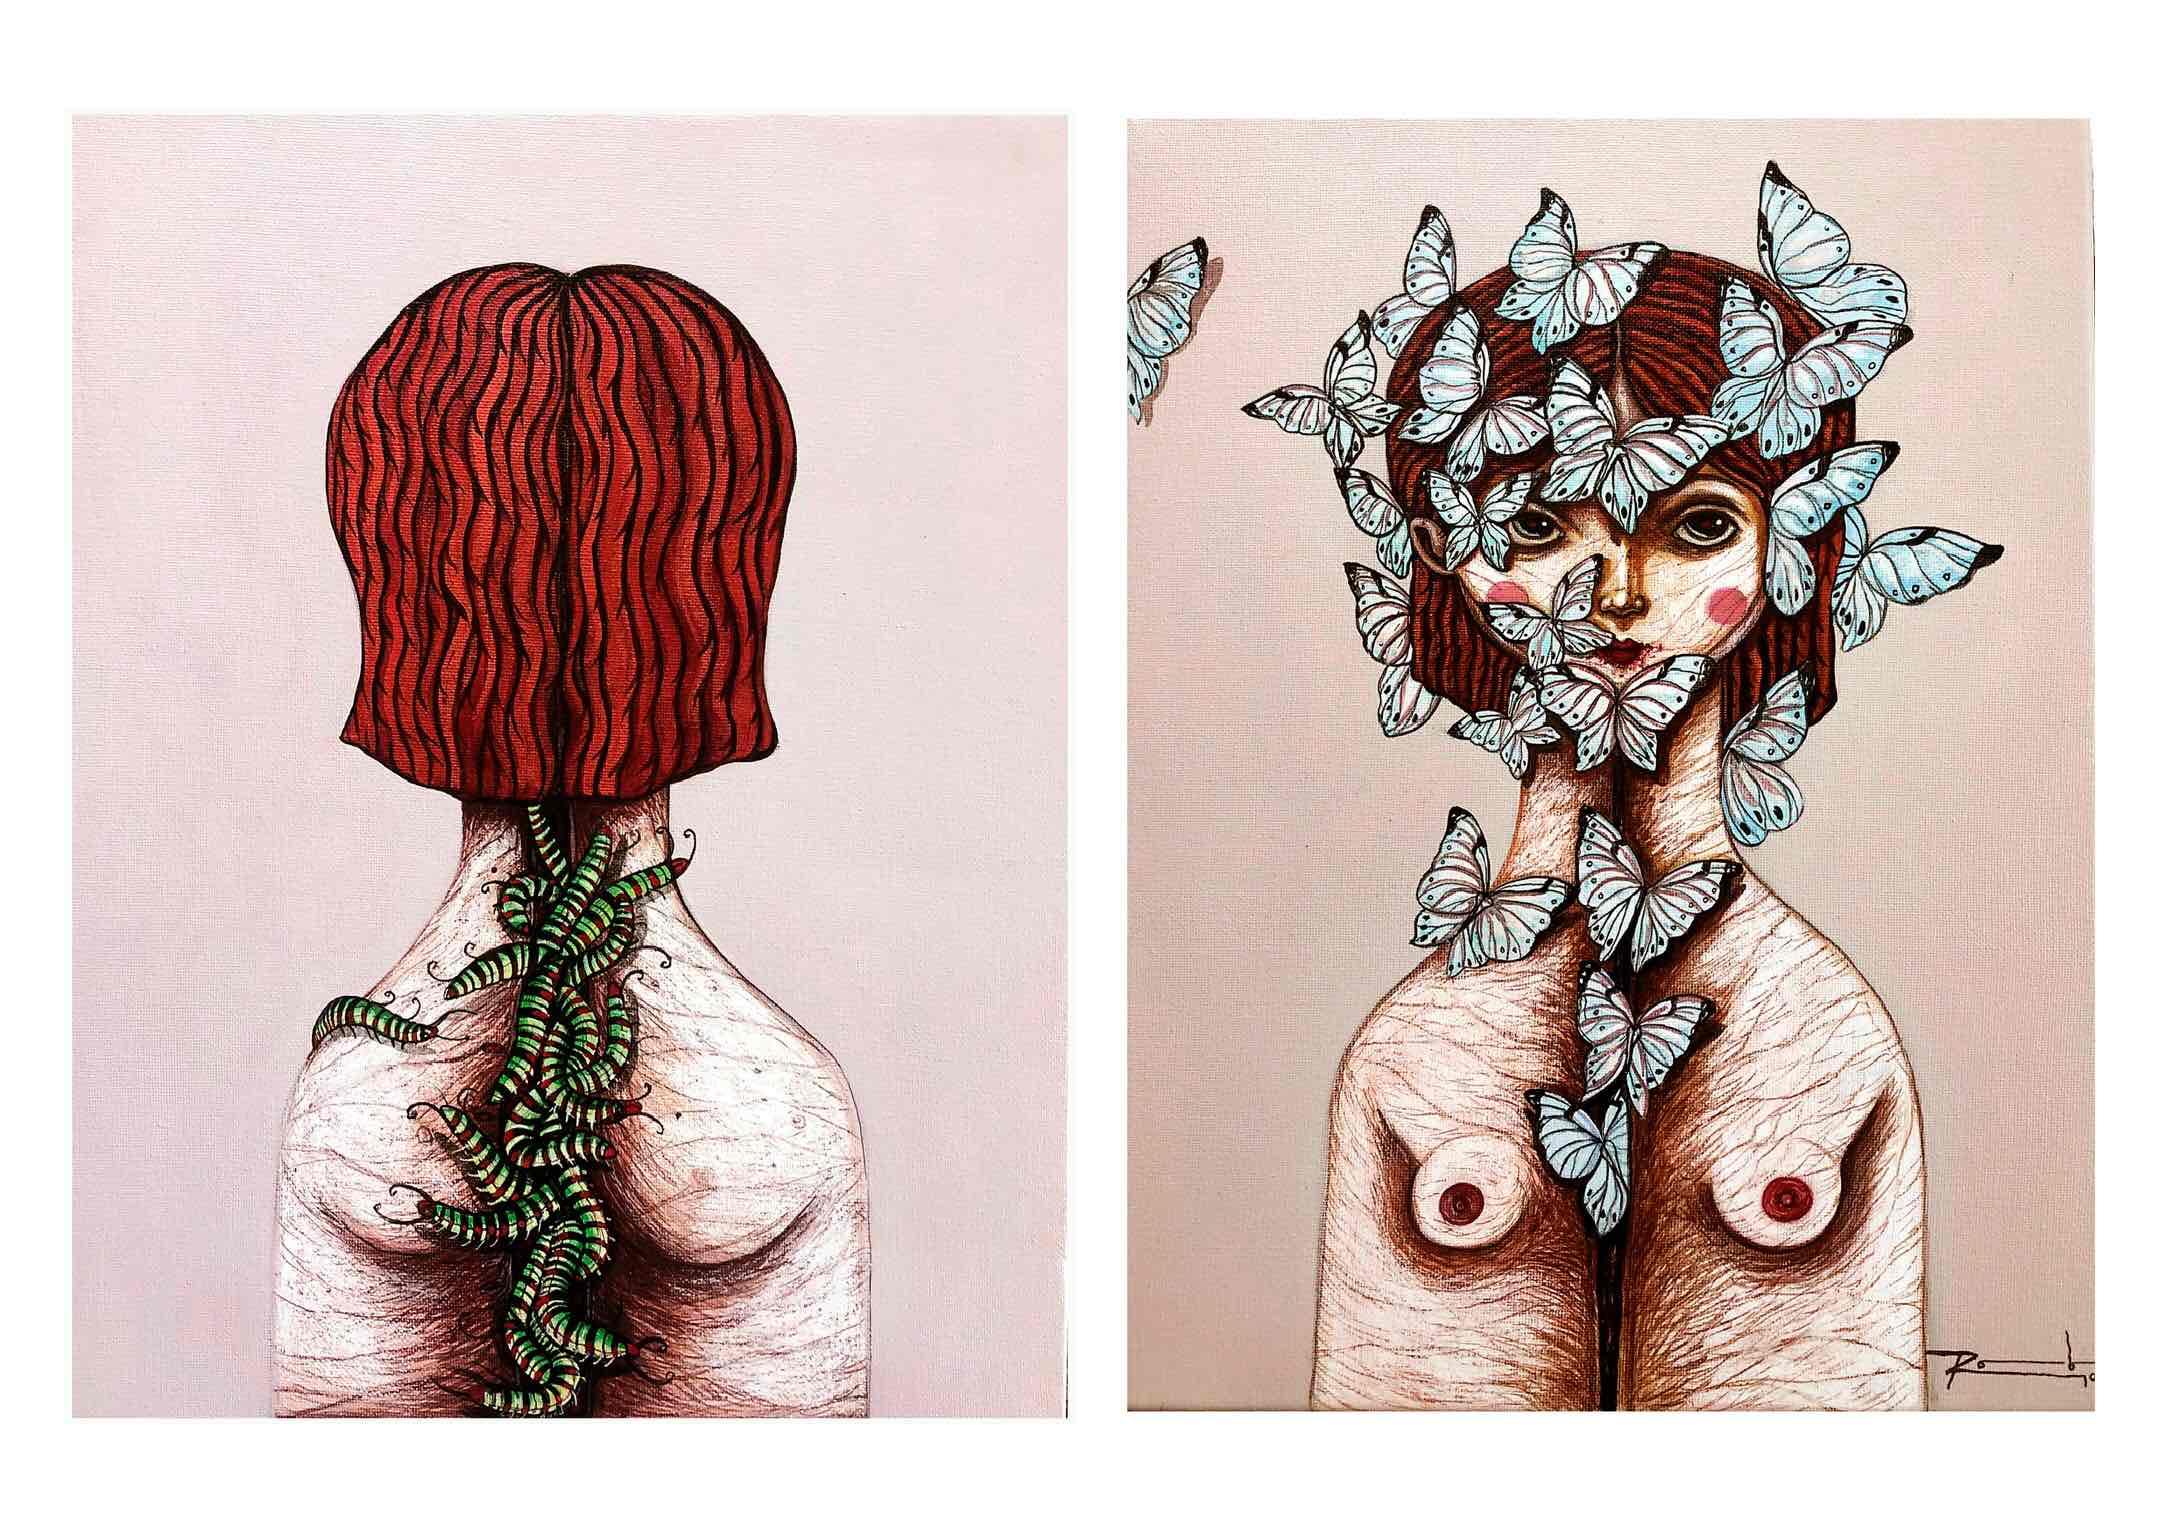 Obra: Metamorfosis